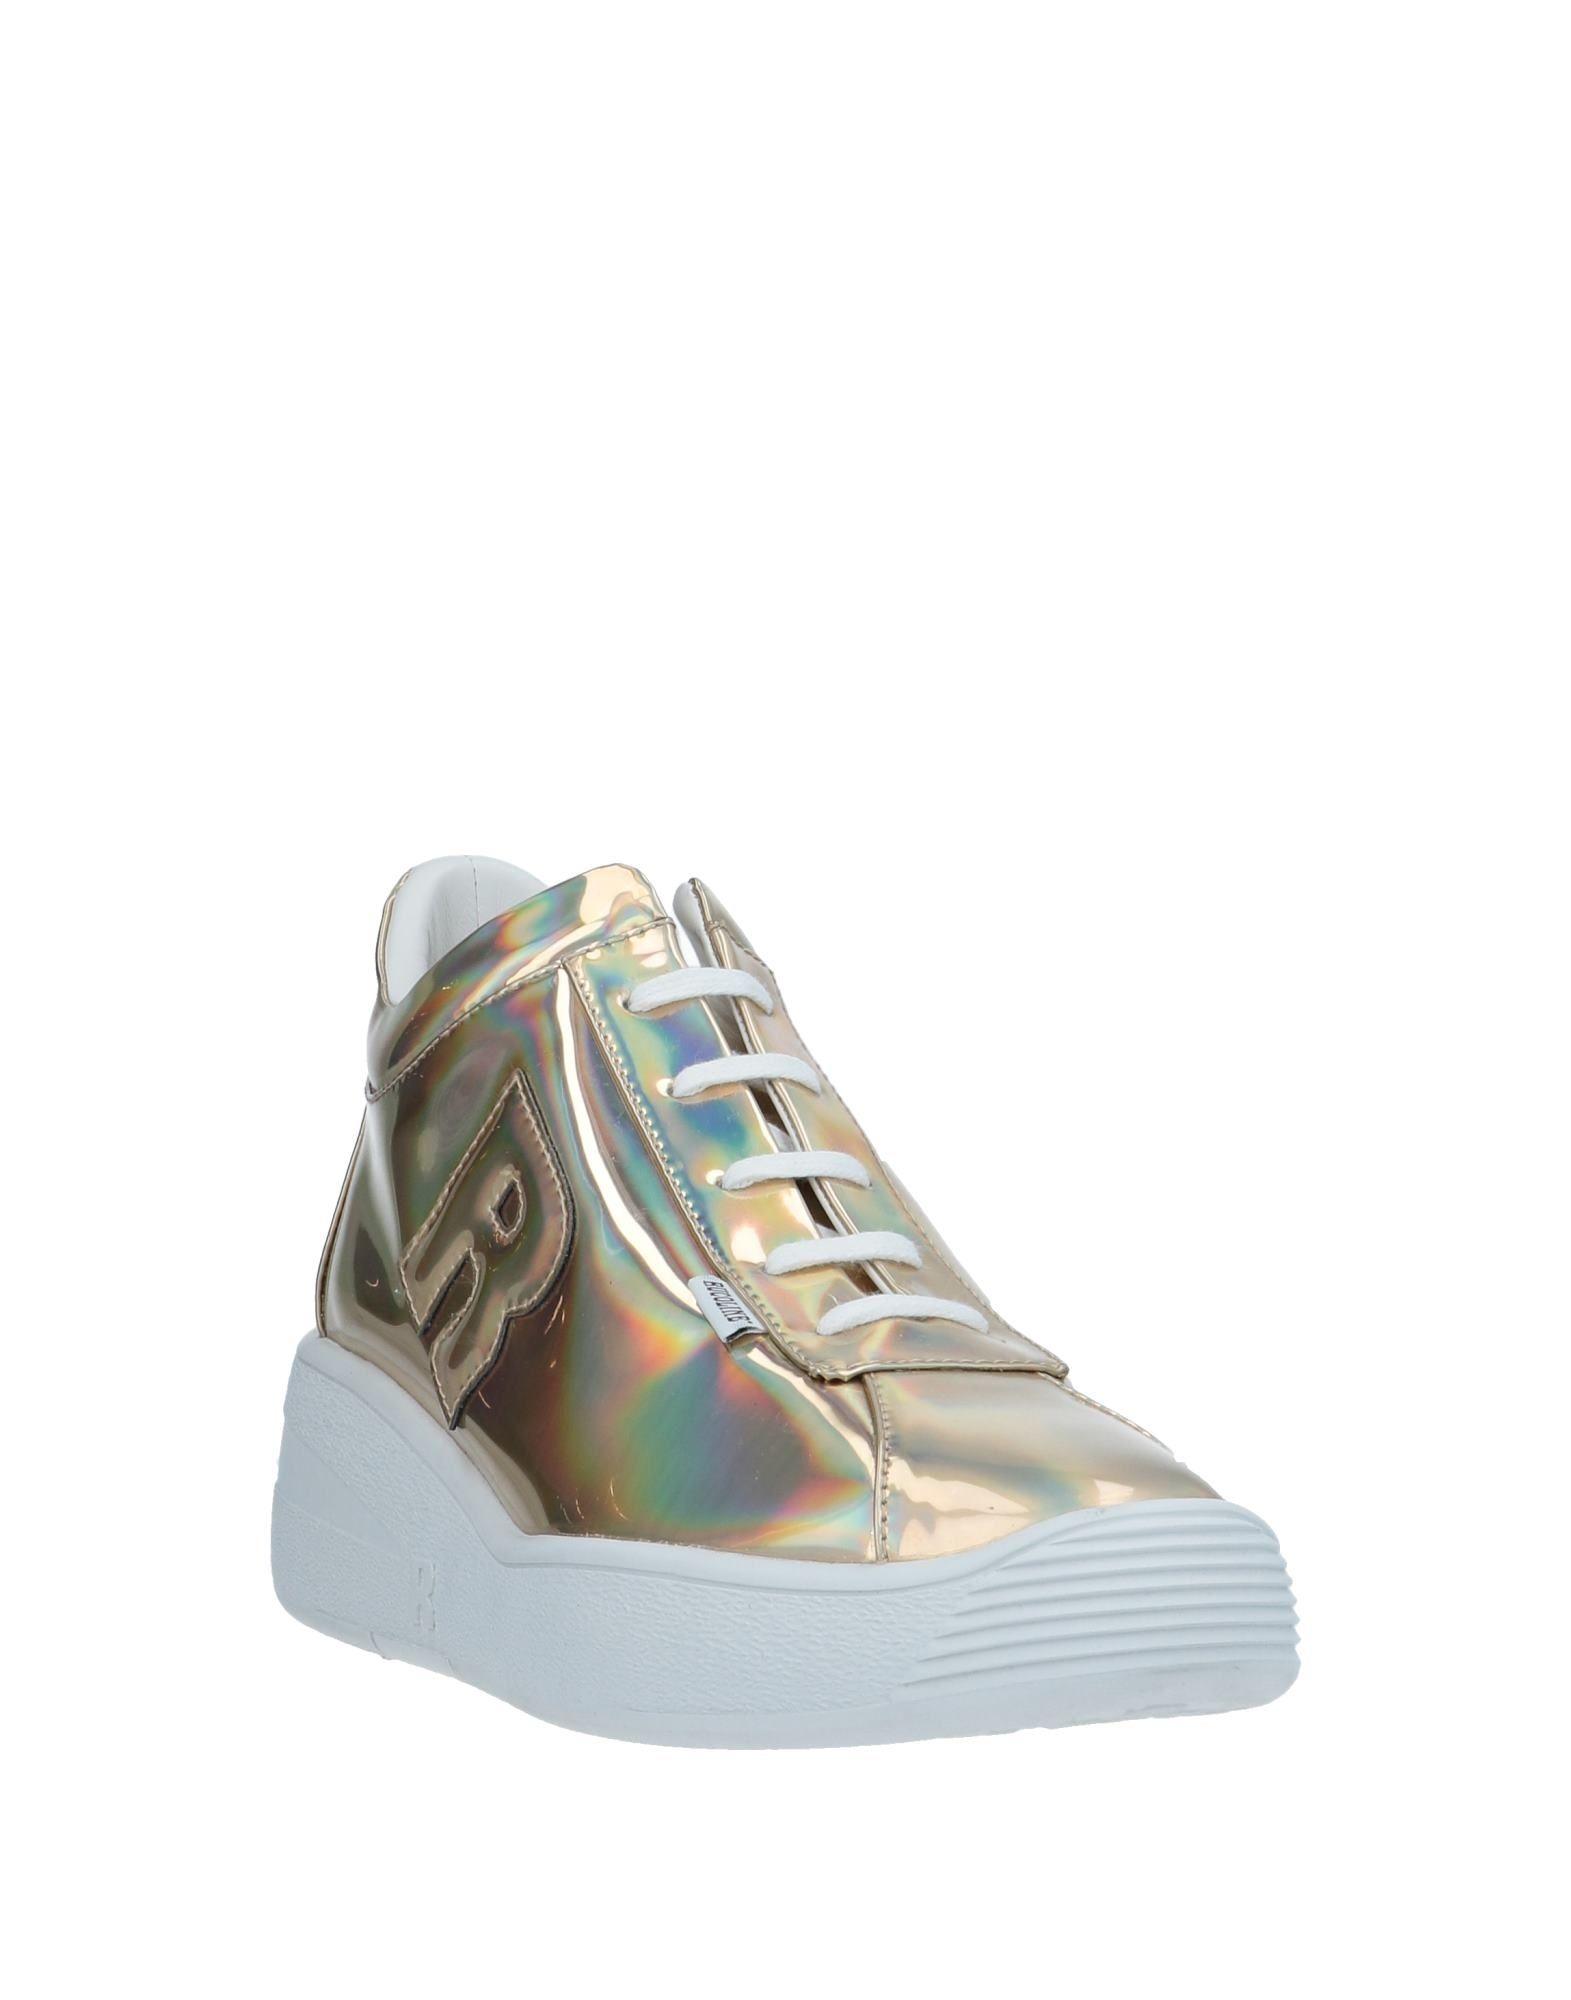 Ruco lohnt Line Sneakers Damen Gutes Preis-Leistungs-Verhältnis, es lohnt Ruco sich 1cd96d